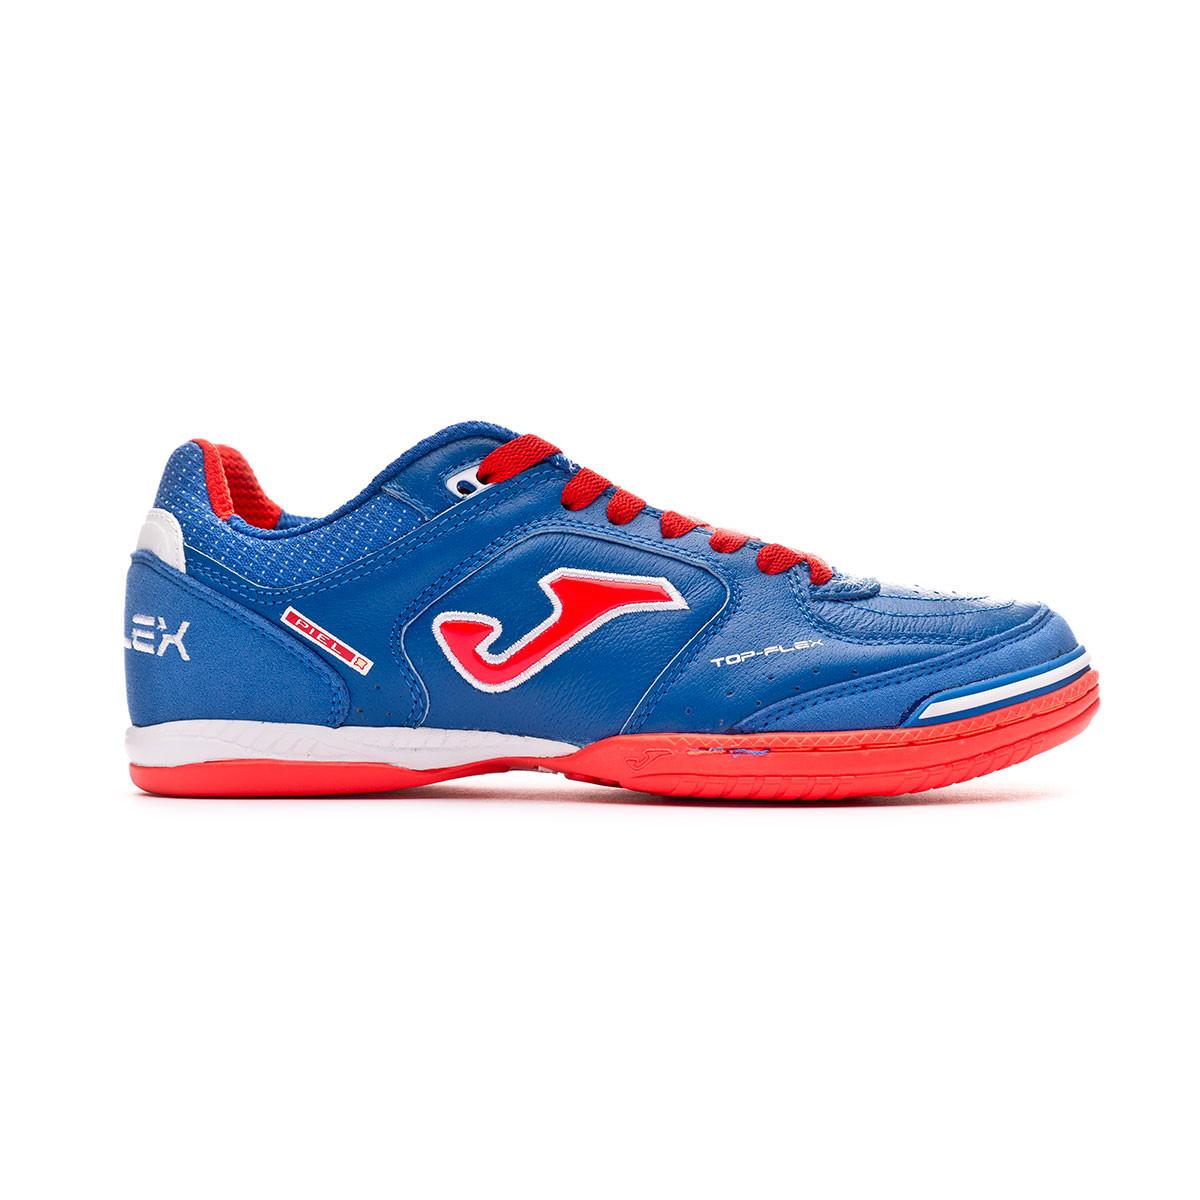 Joma Top Flex Blue-Orange Chaussure de Futsal